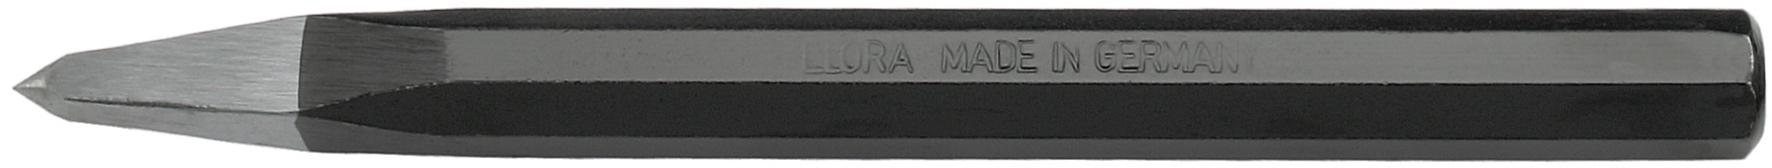 Đột lấy dấu ELORA 364 Series